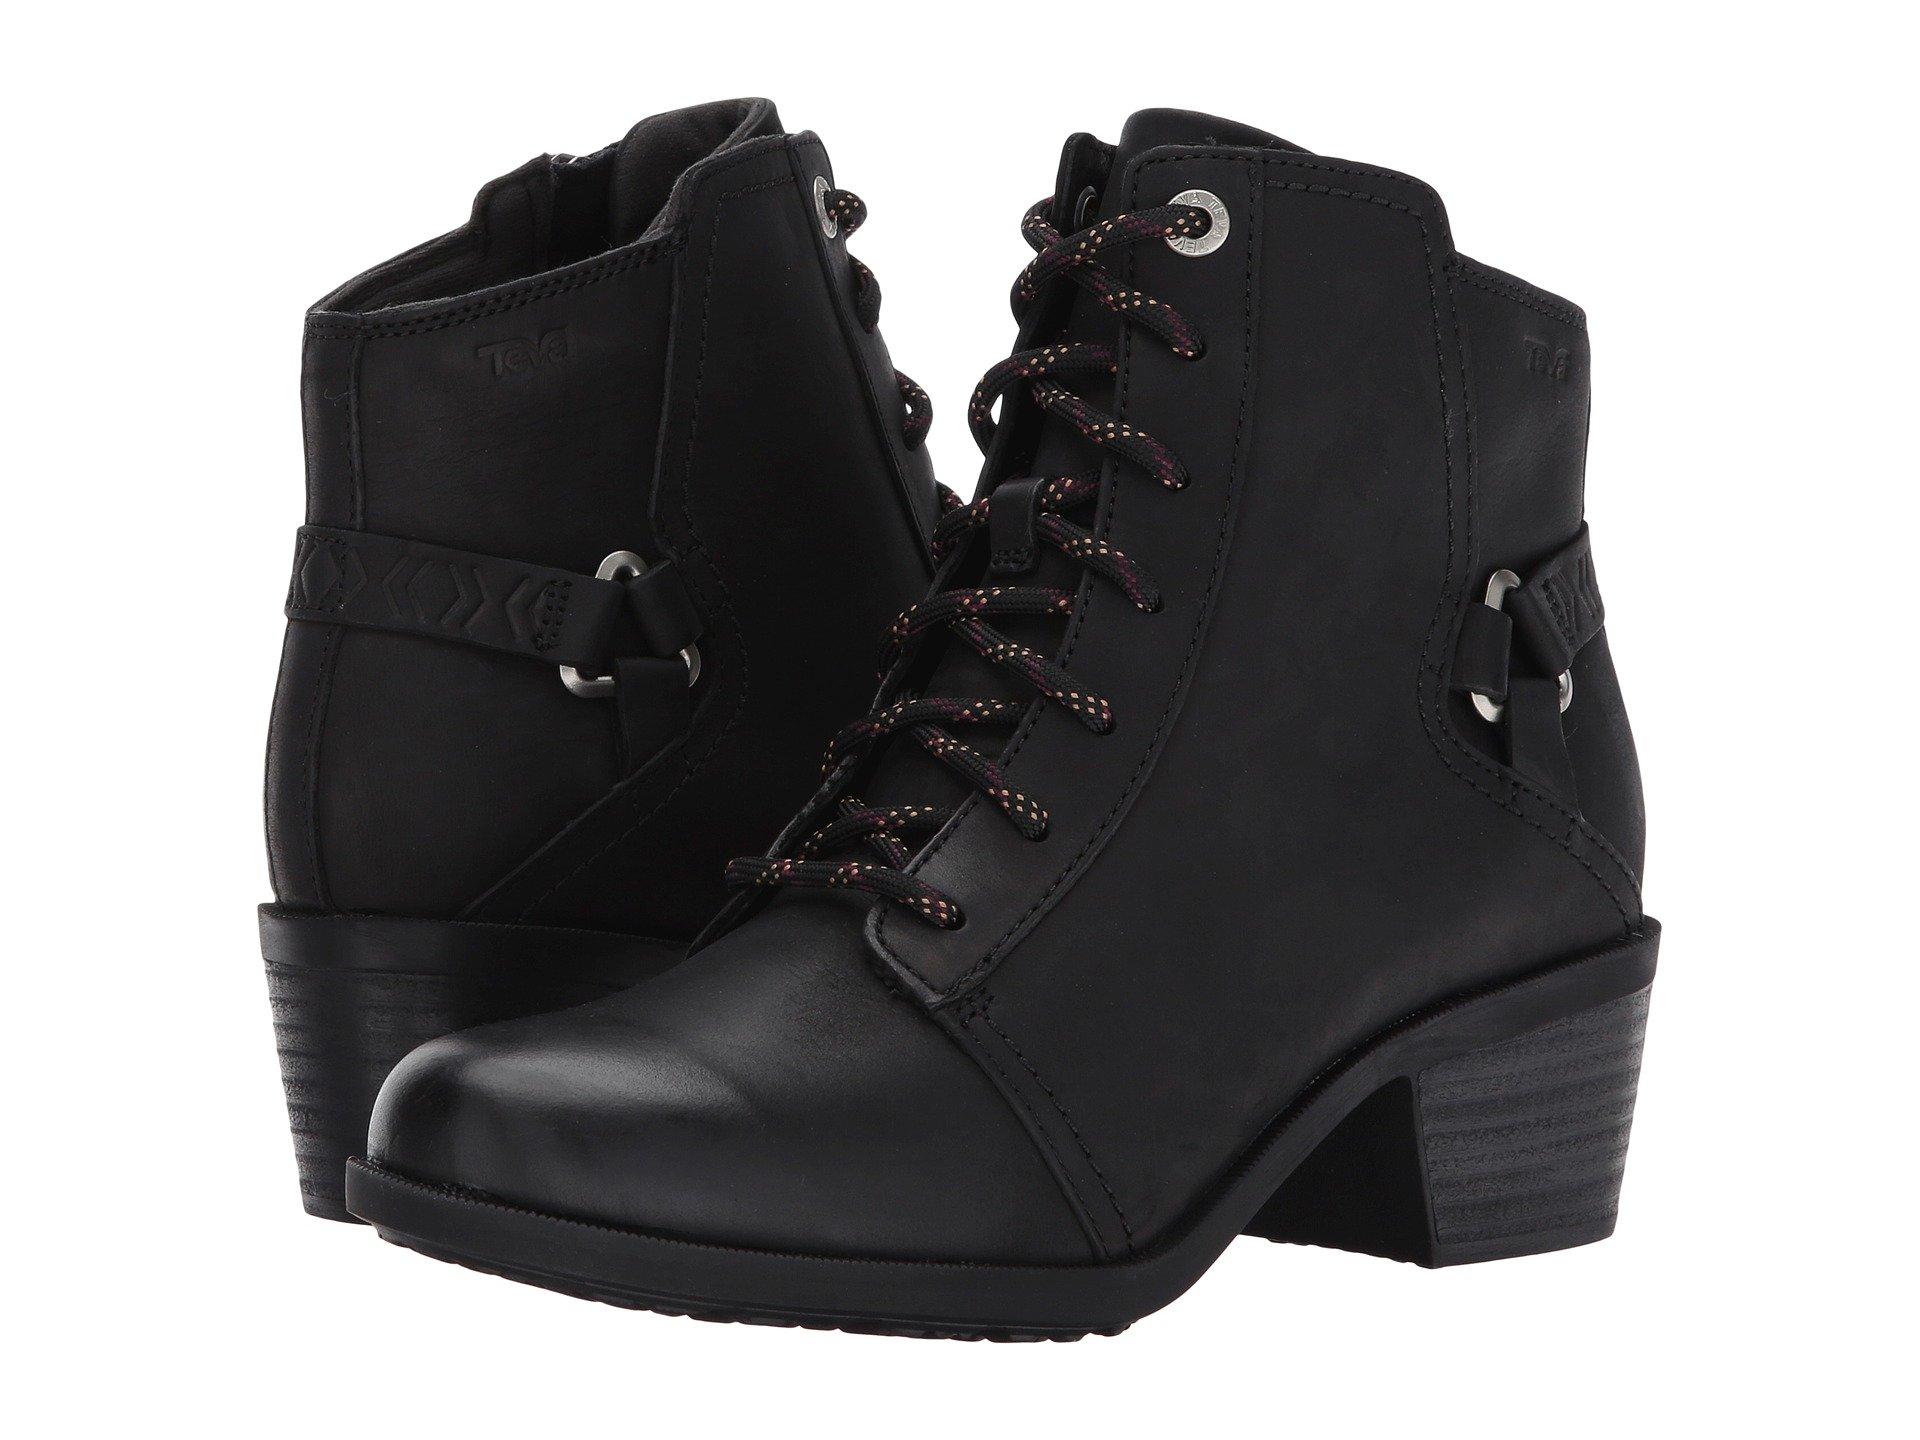 e48cbf987cd44 Women s Teva Boots + FREE SHIPPING